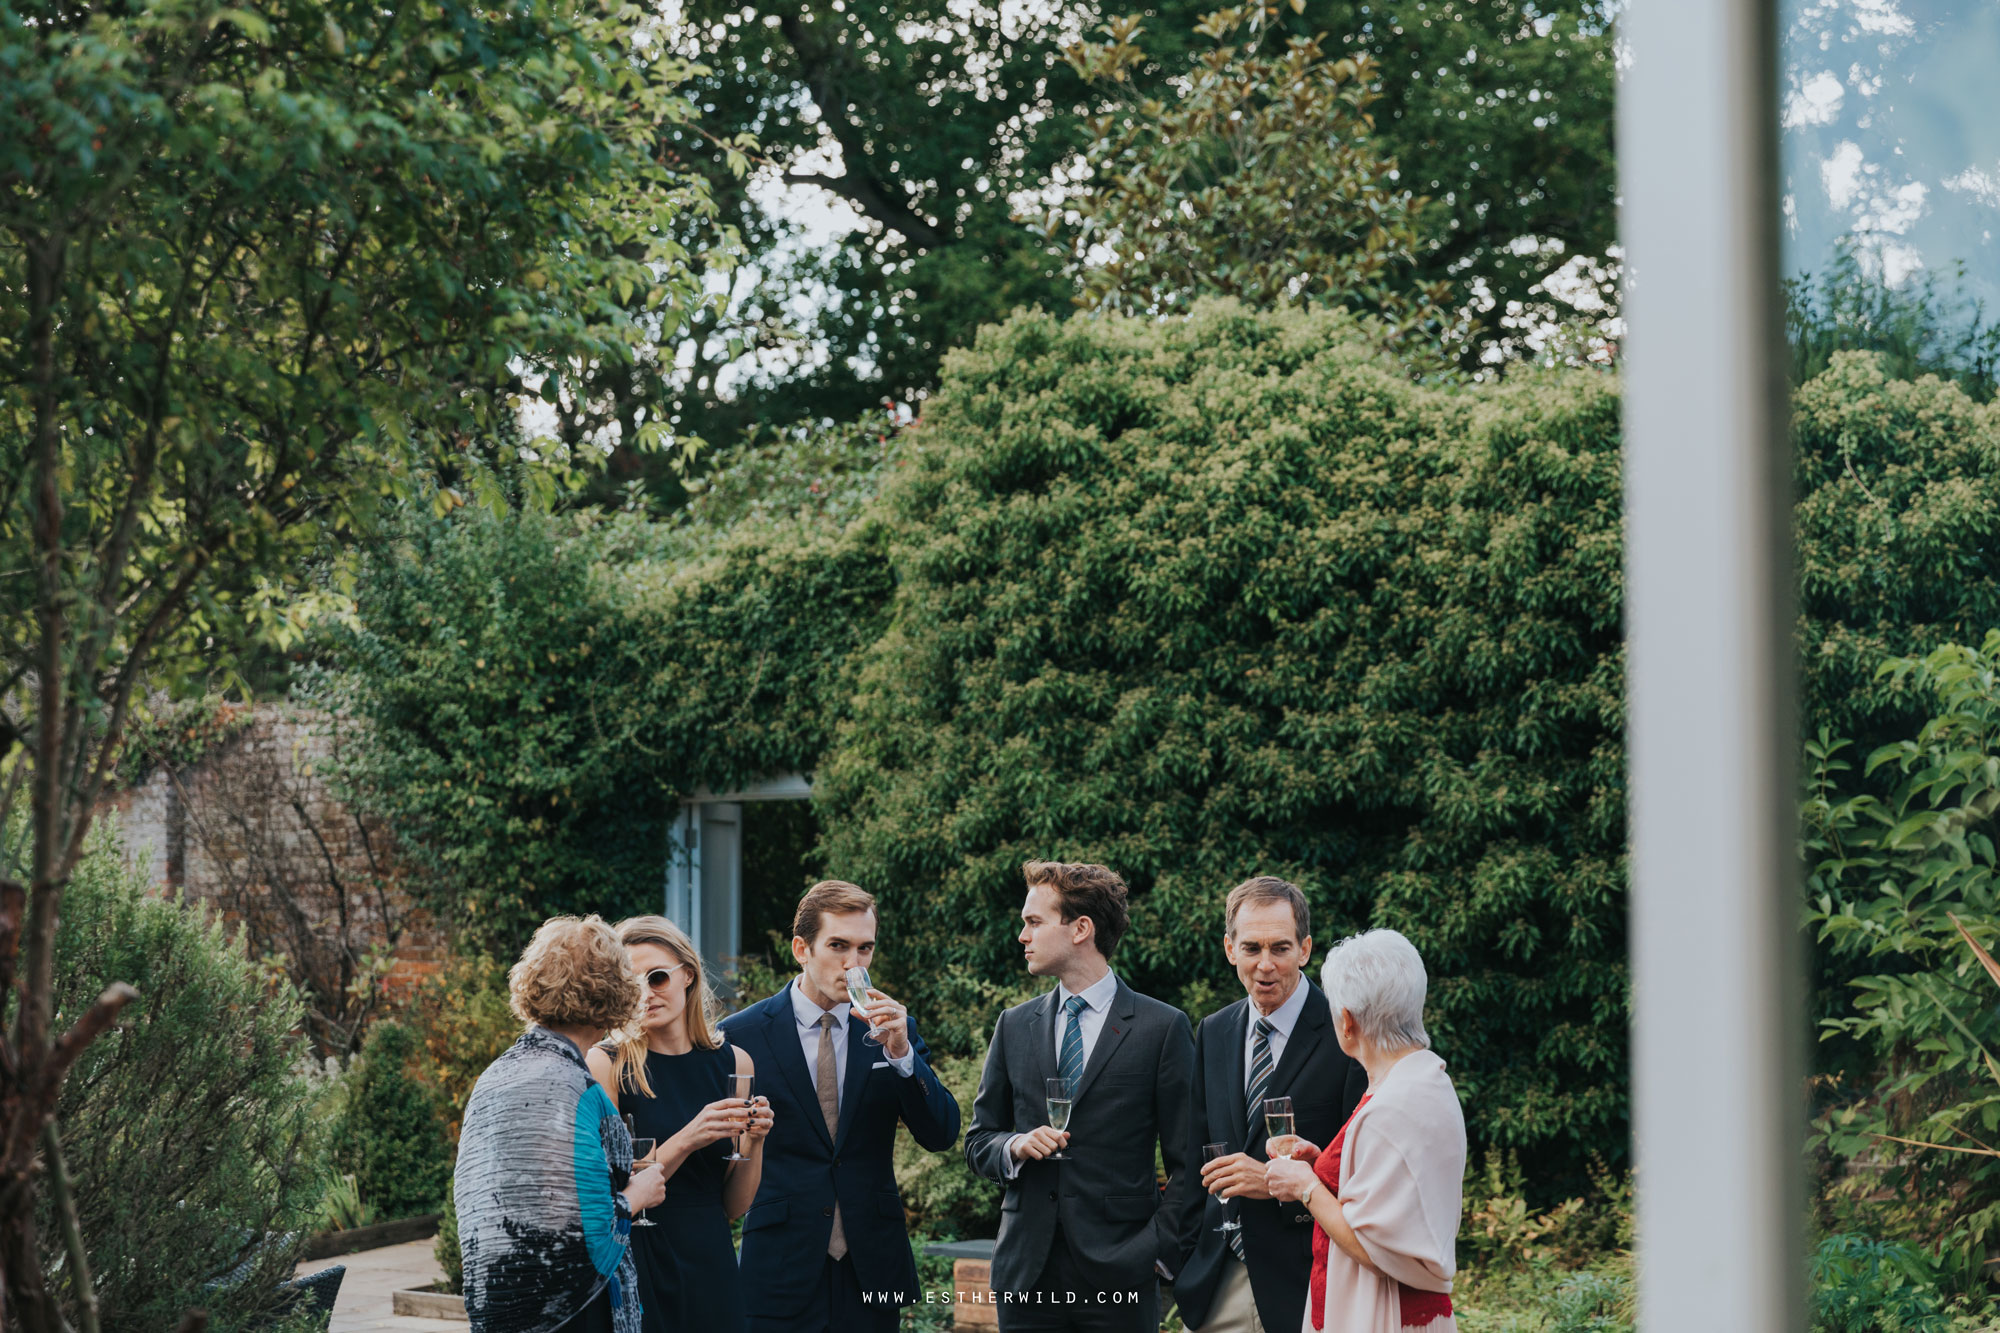 Northbrook_Park_Farnham_Surrey_London_Wedding_Hindu_Fusion_Esther_Wild_Photographer_IMG_5755.jpg